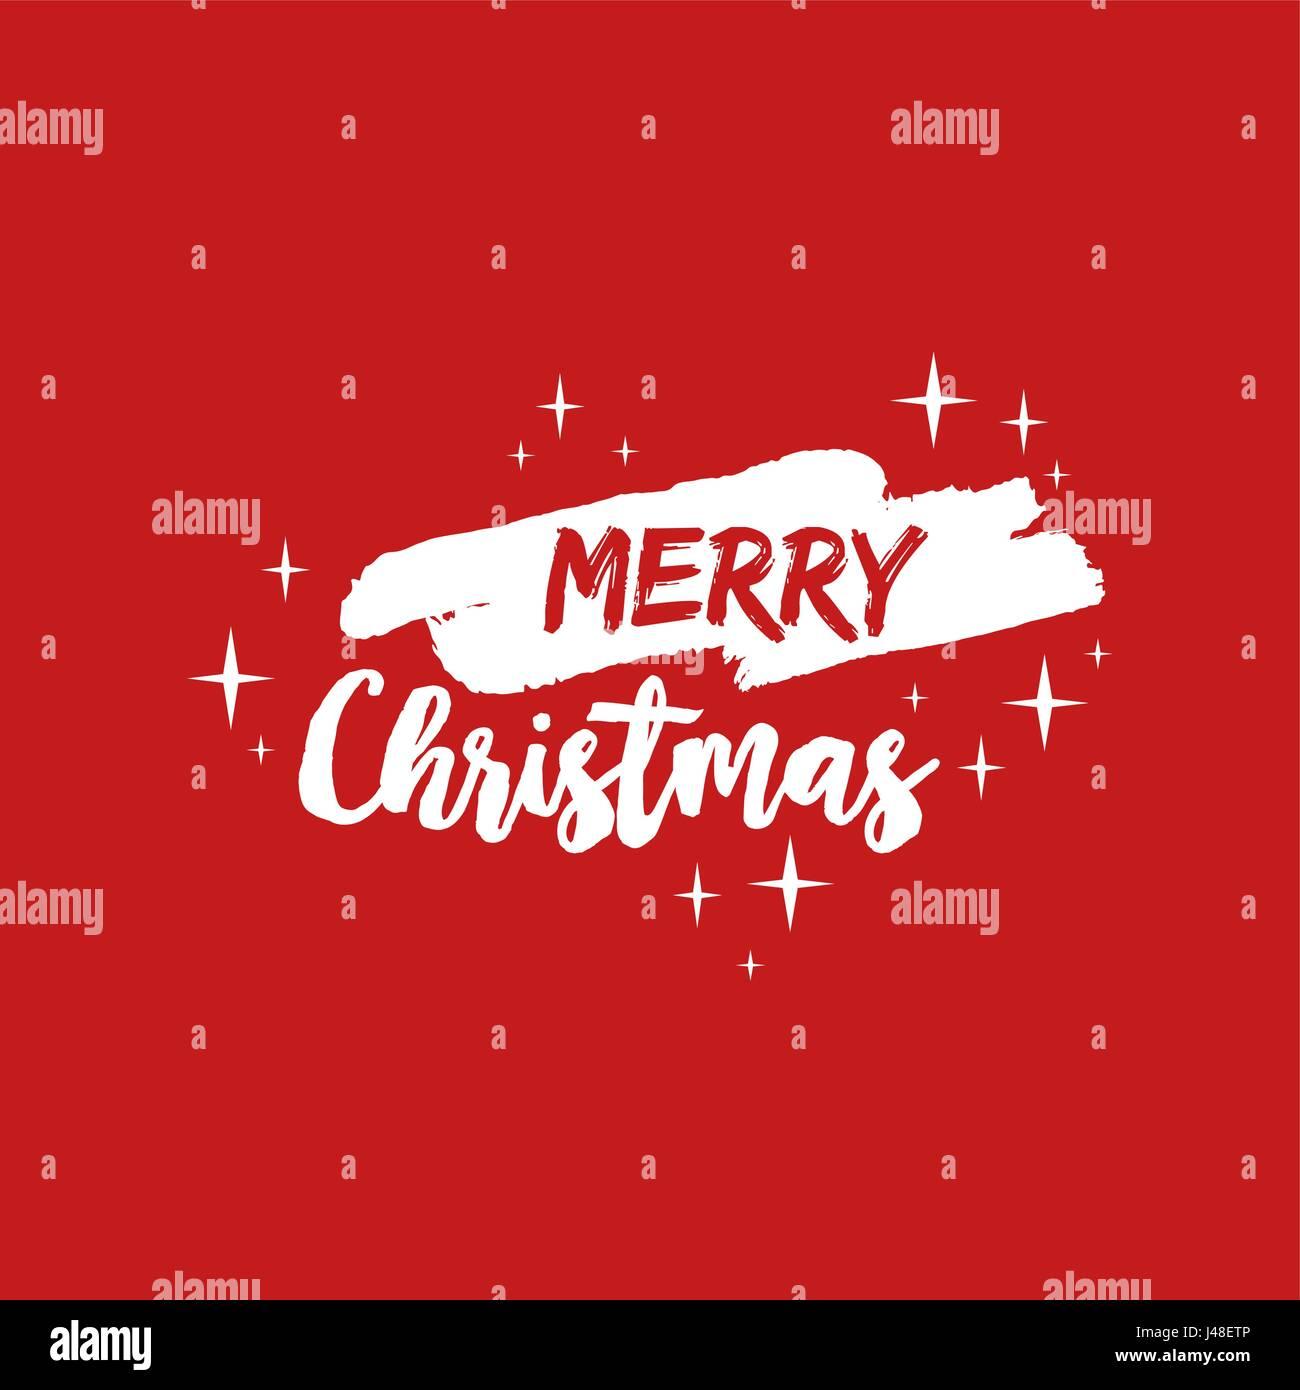 Etp Stock Quote Merry Christmas Calligraphic Quote Design Handwritten Brush Font